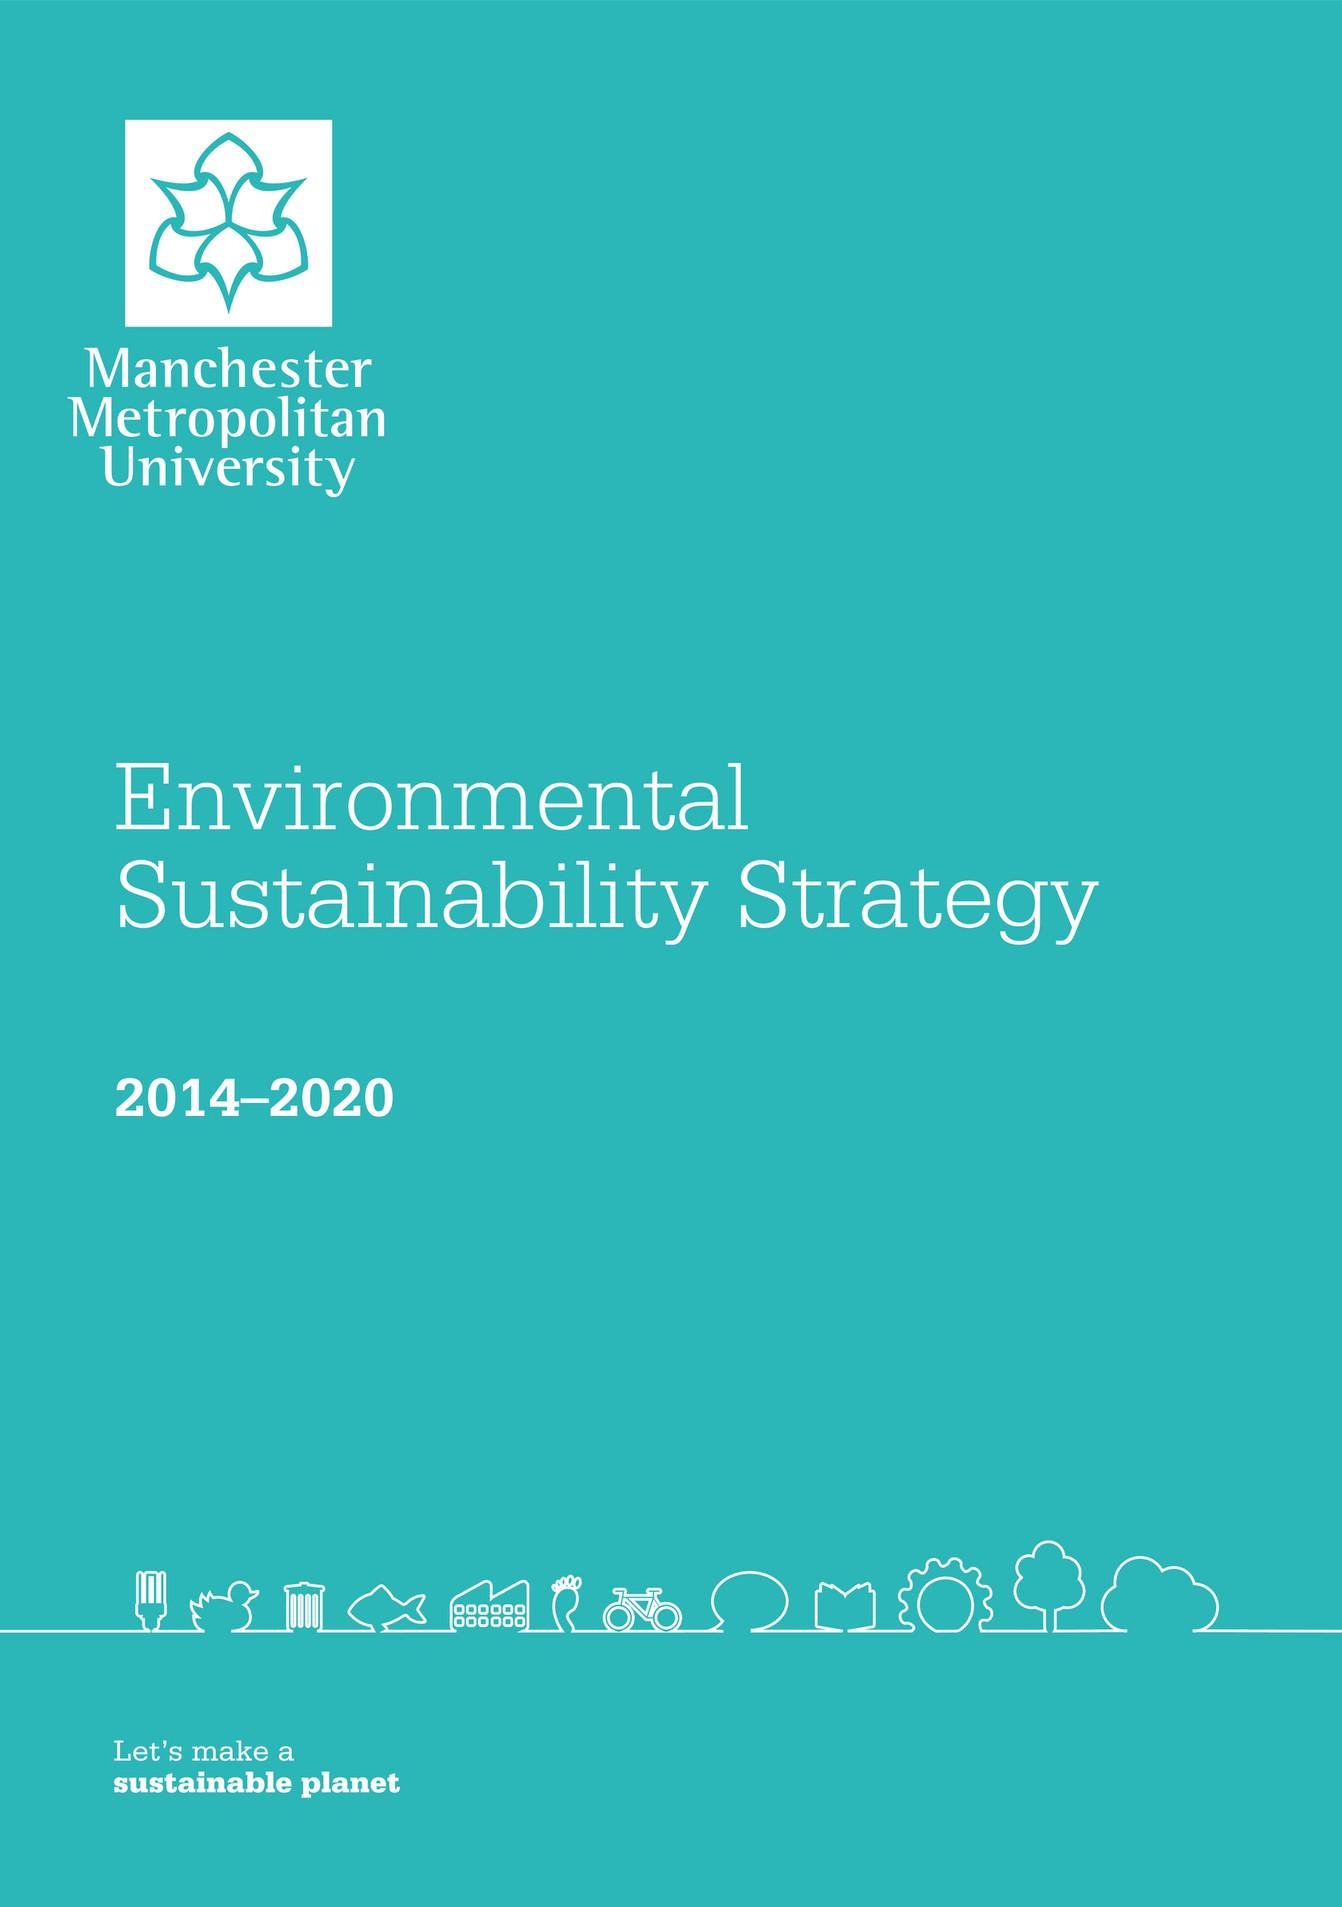 Manchester university 2020 strategy